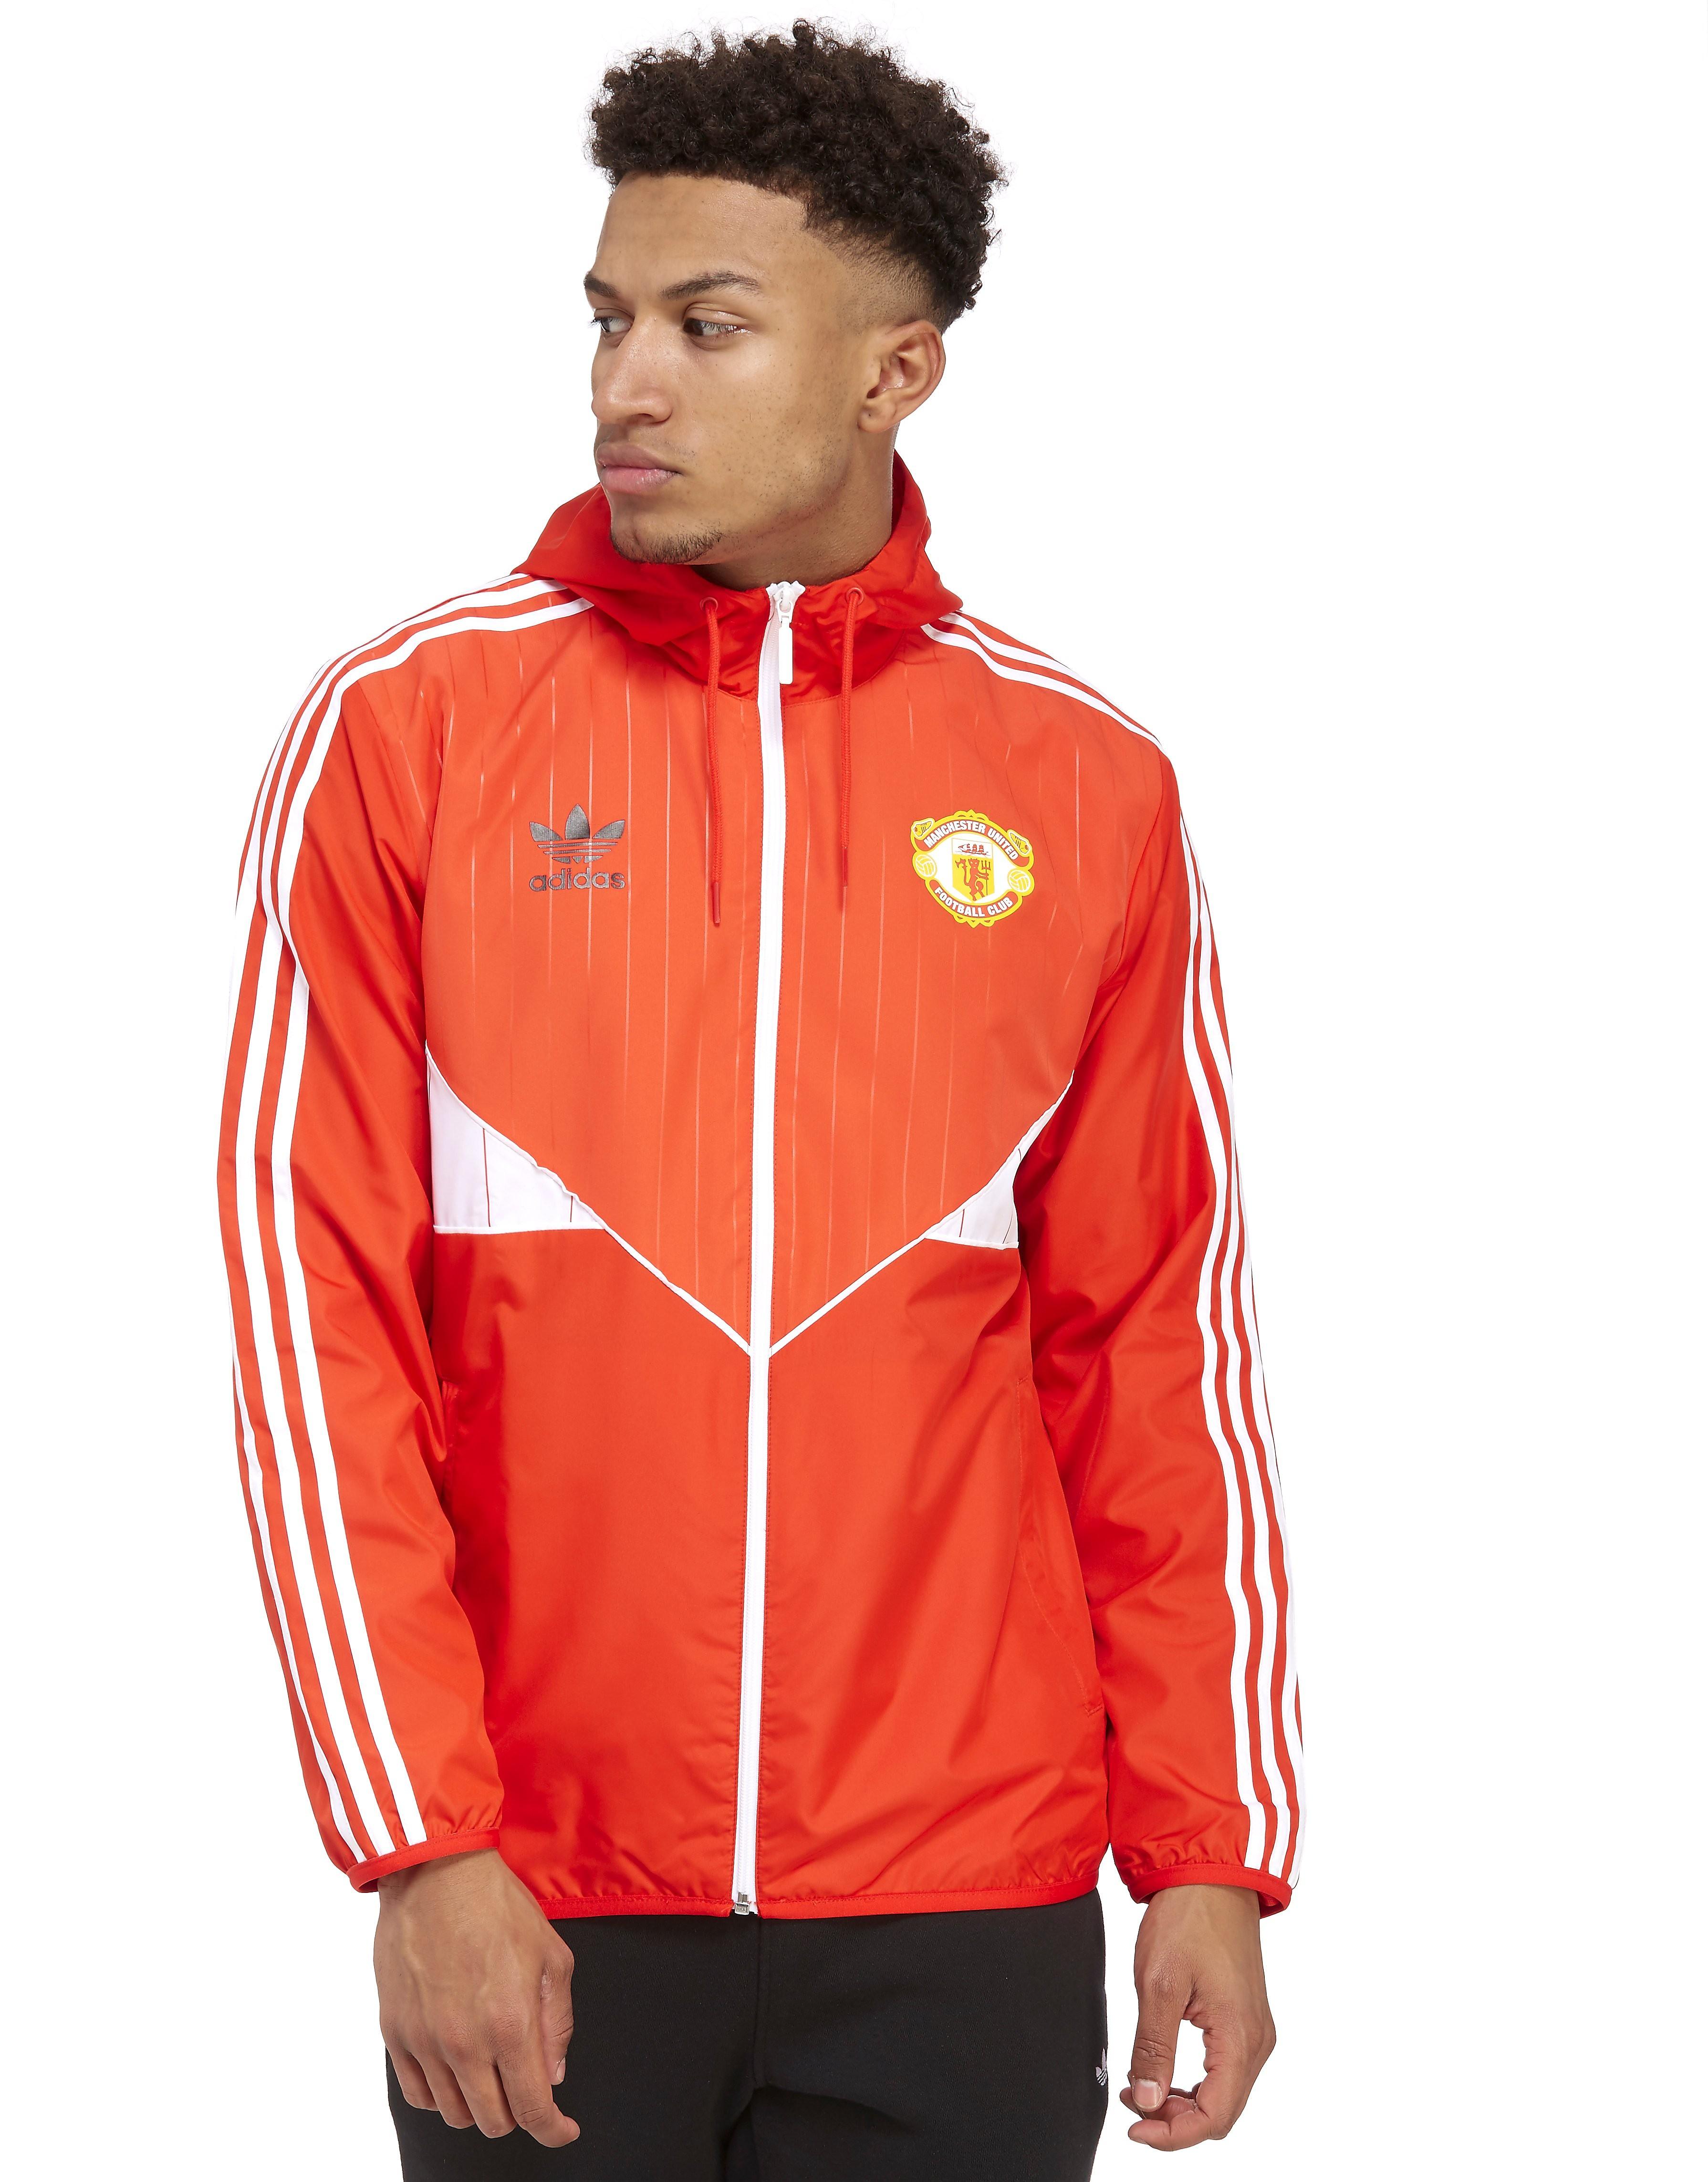 adidas Originals Manchester United FC Windbreaker Jacket